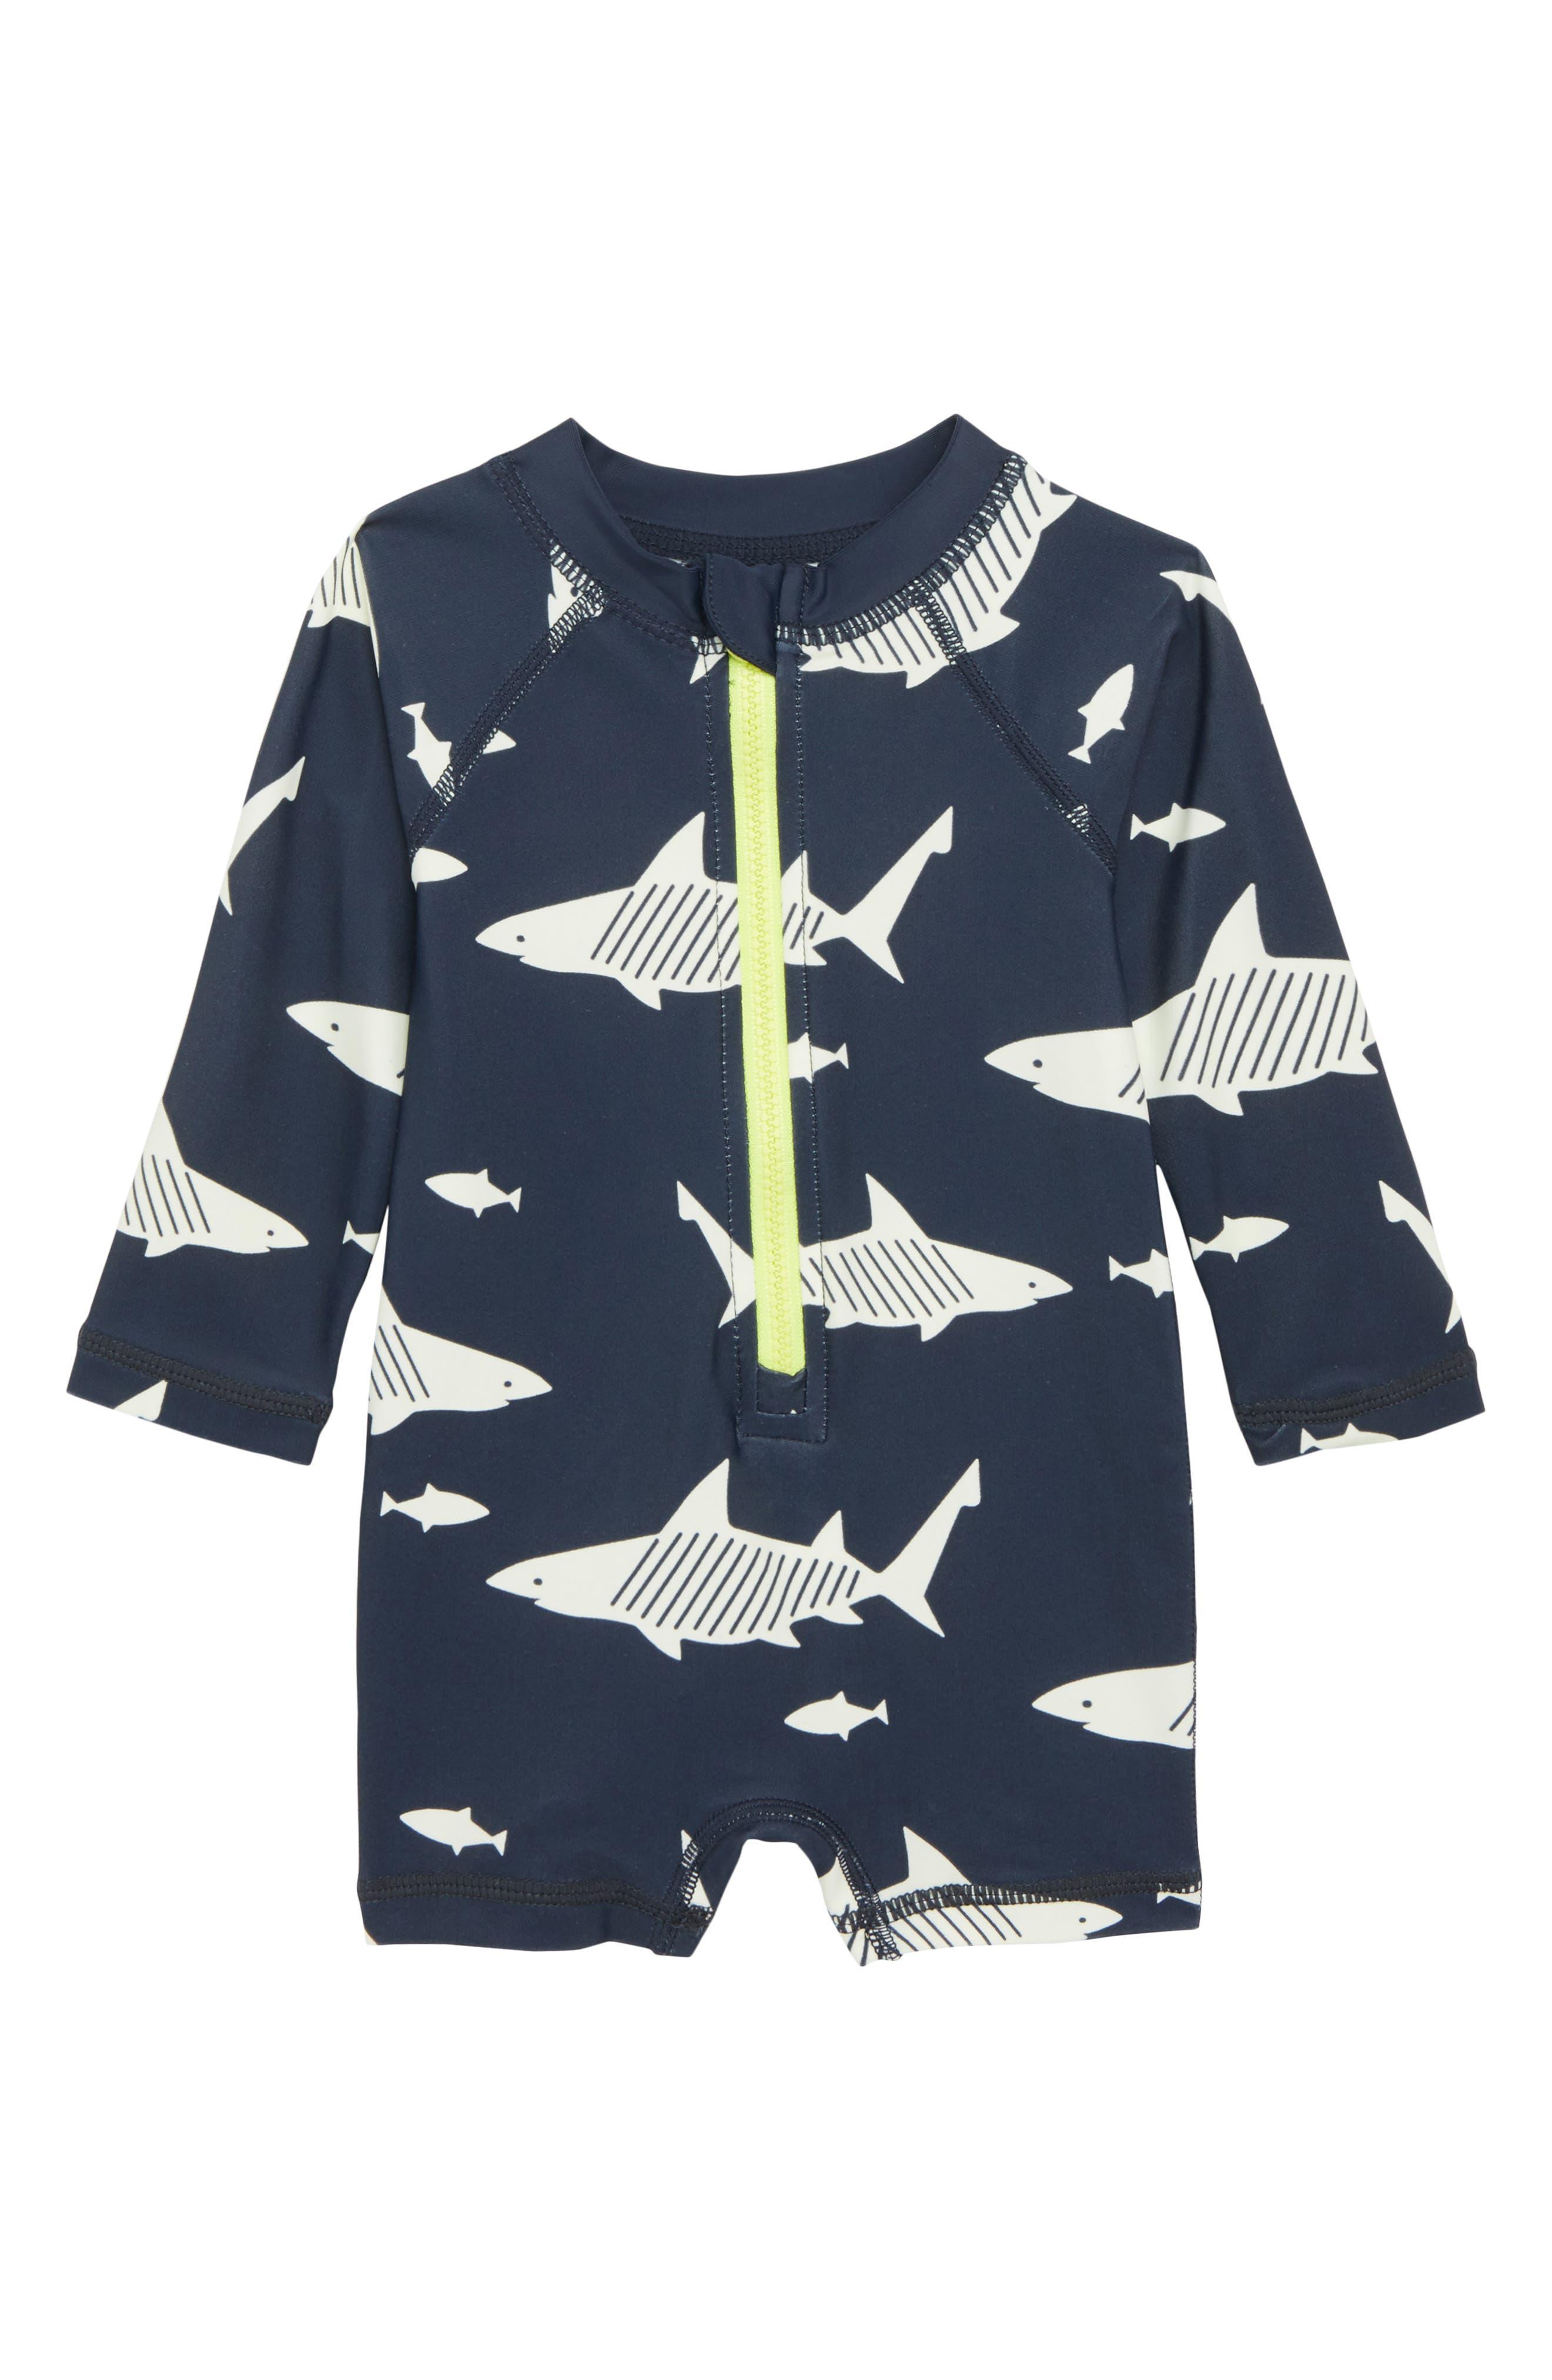 Tea Collection Shark One-Piece Rashguard (Baby Boys)